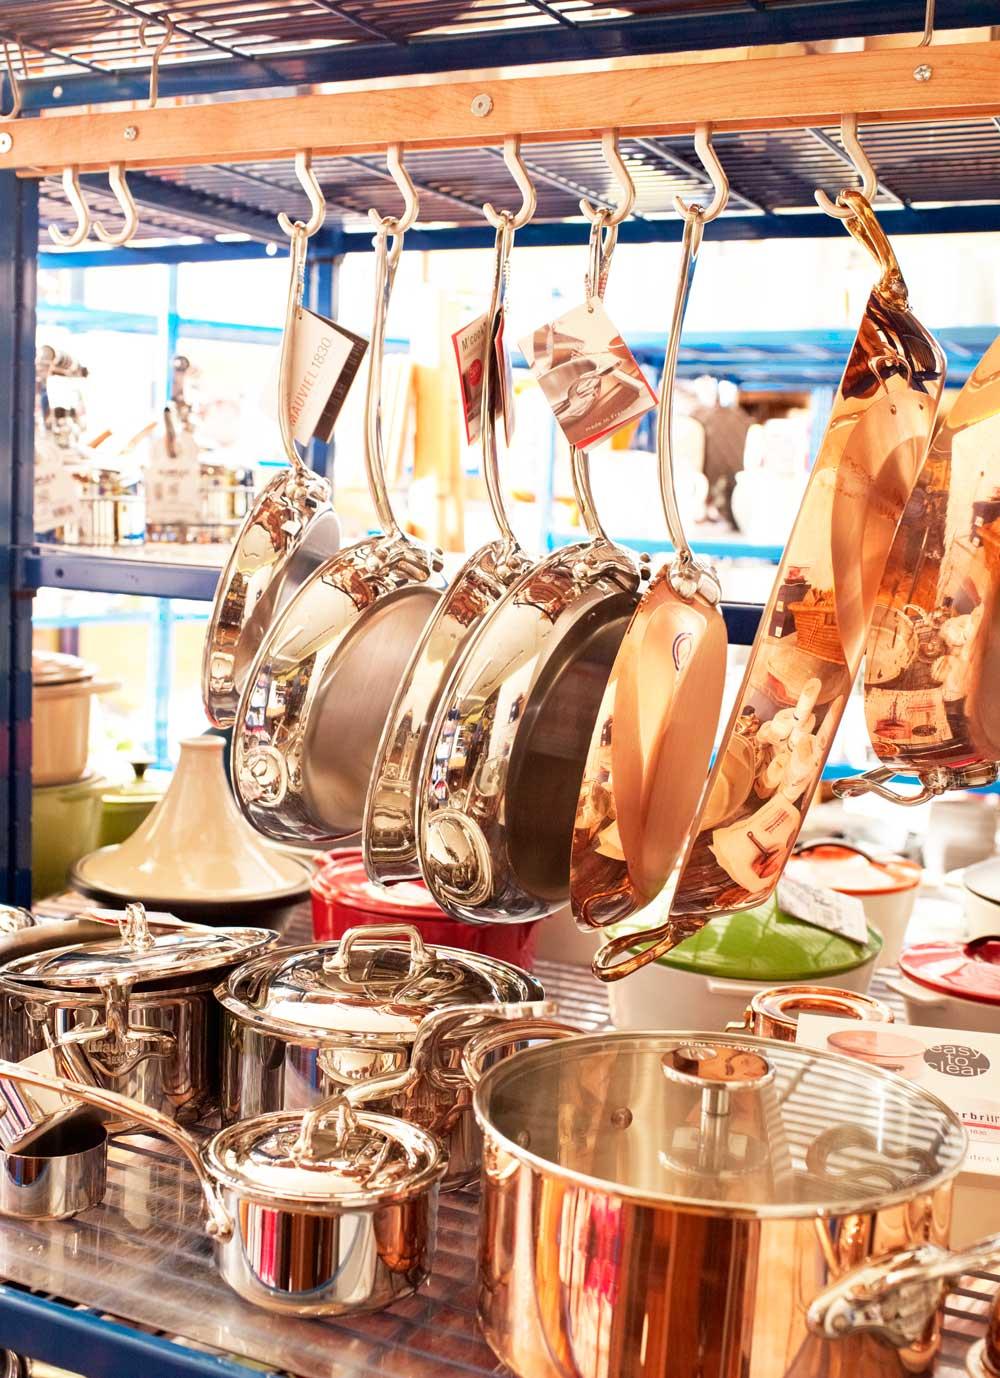 Hamptons_Bridgehampton_Loaves_Fishes_Cook_shop_02.jpg